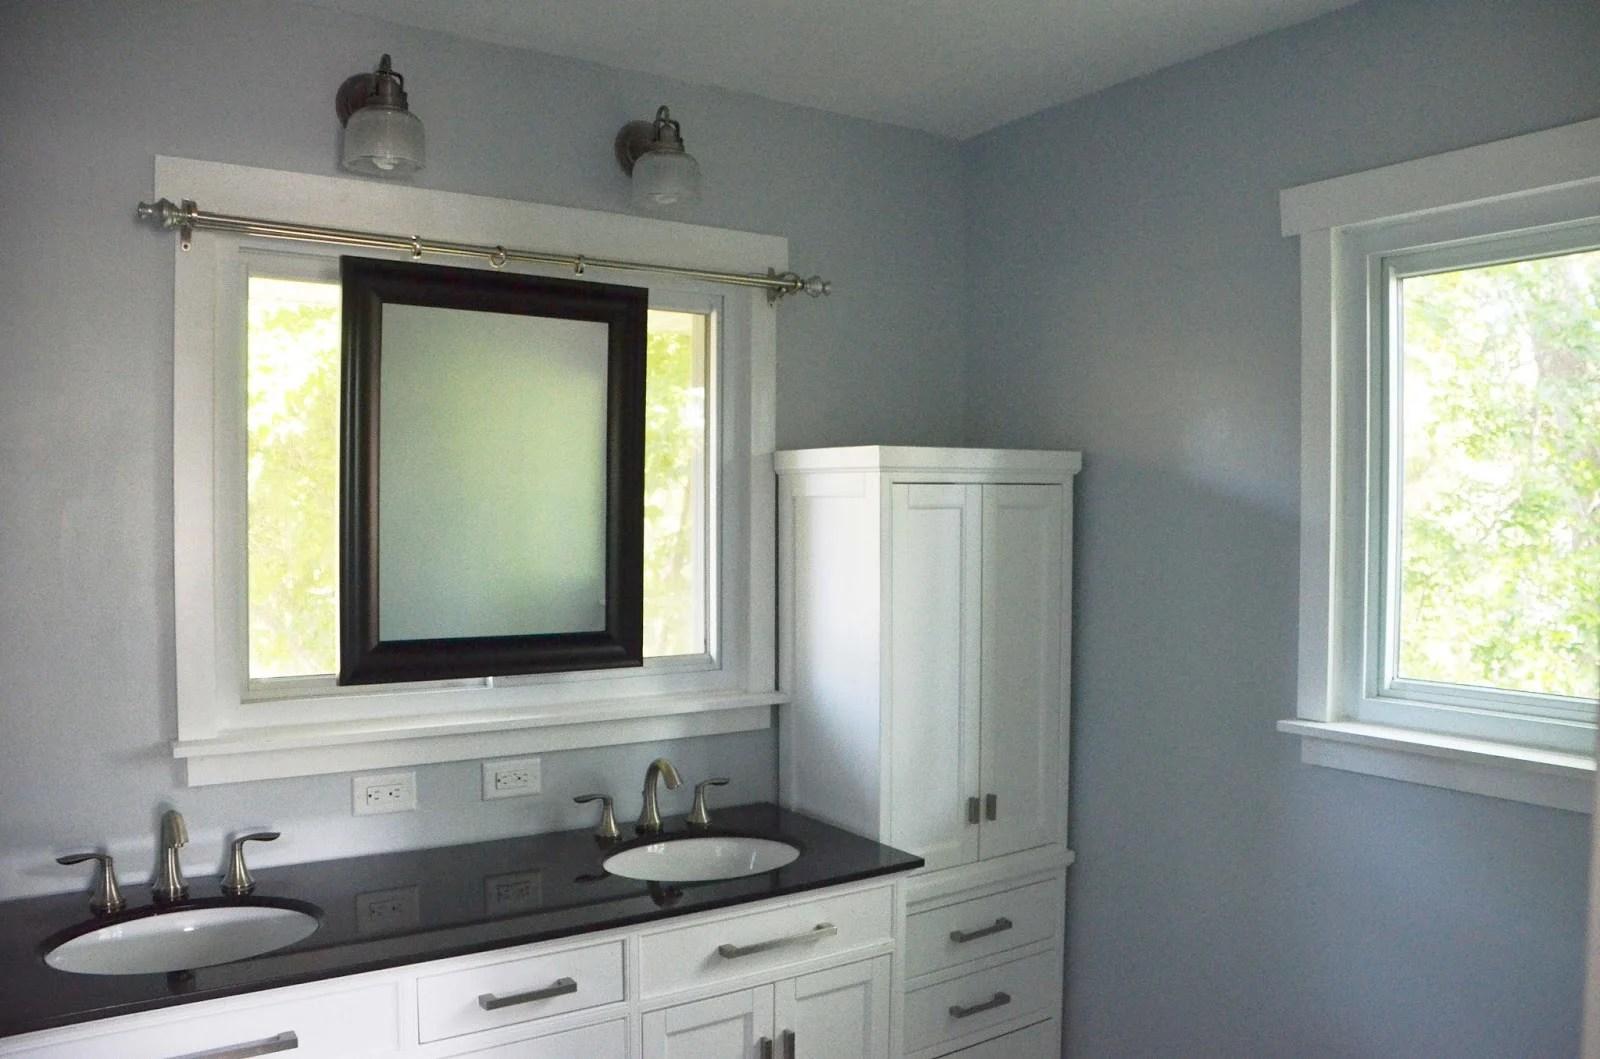 Bathroom Remodel Using Sliding Mirror To Preserve Natural Light